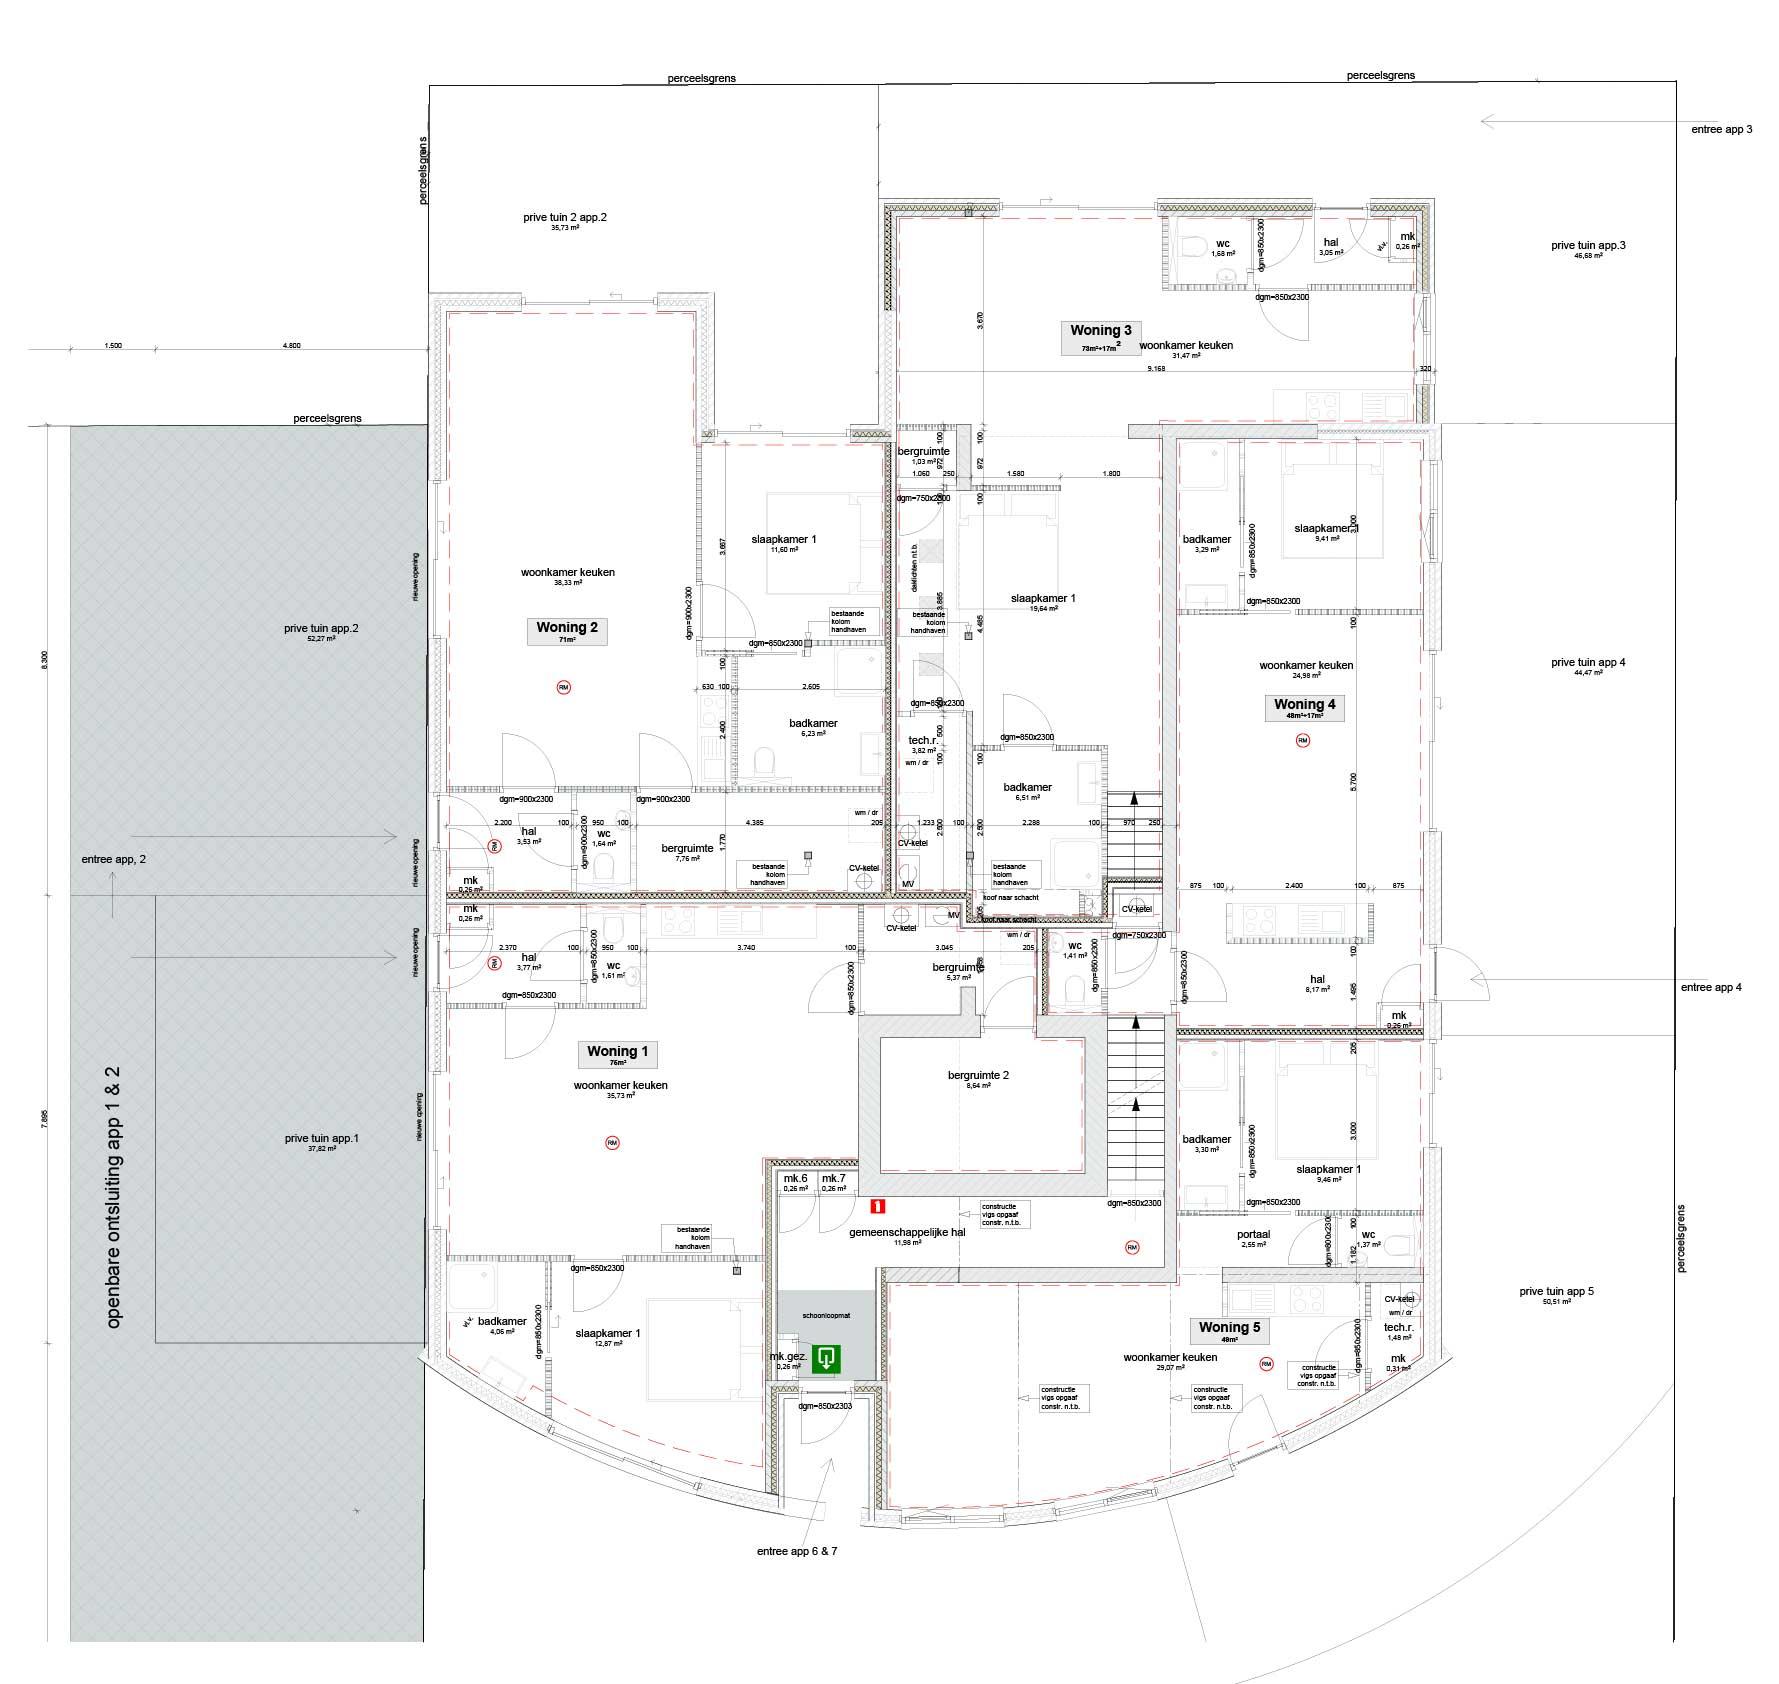 Blok7 plattegrond beganegrond